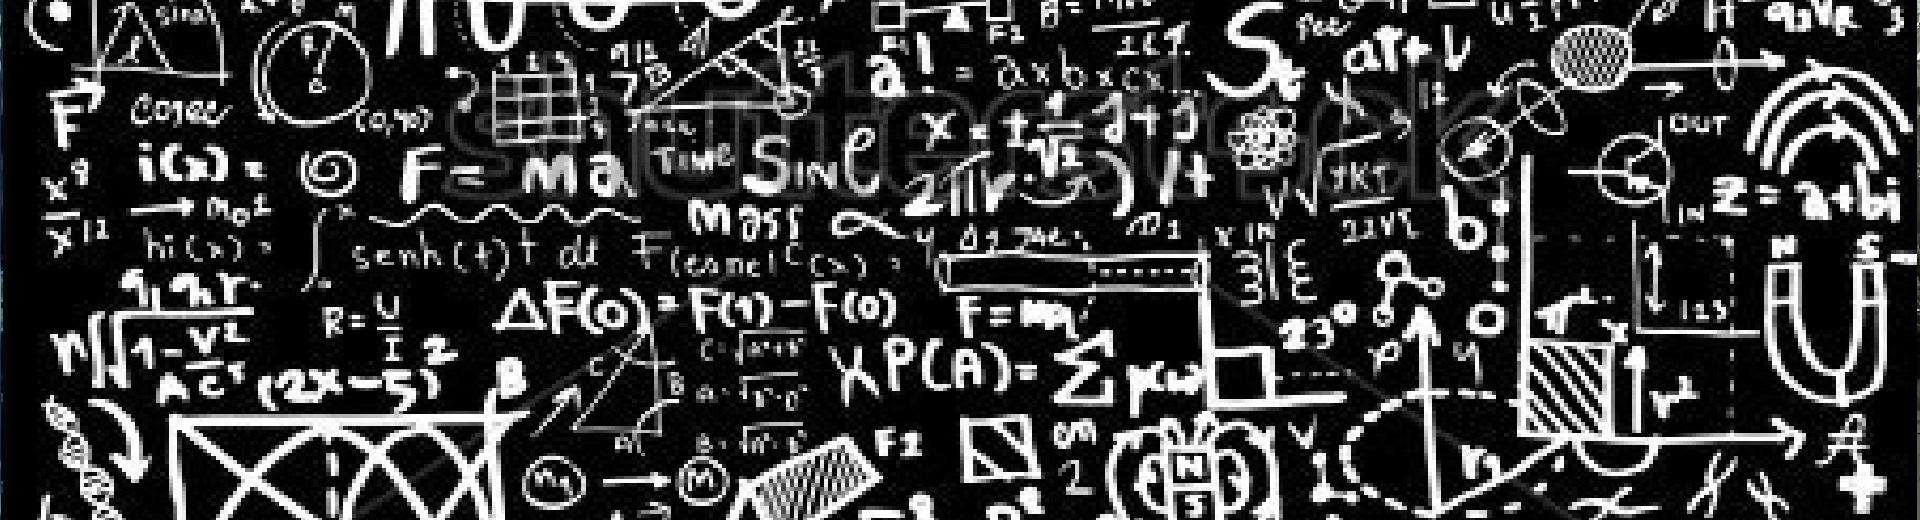 Портал КФУ \ Образование \ Институт физики \ Аспирантура и докторантура \ 13.00.02 - Теория и методика обучения и воспитания